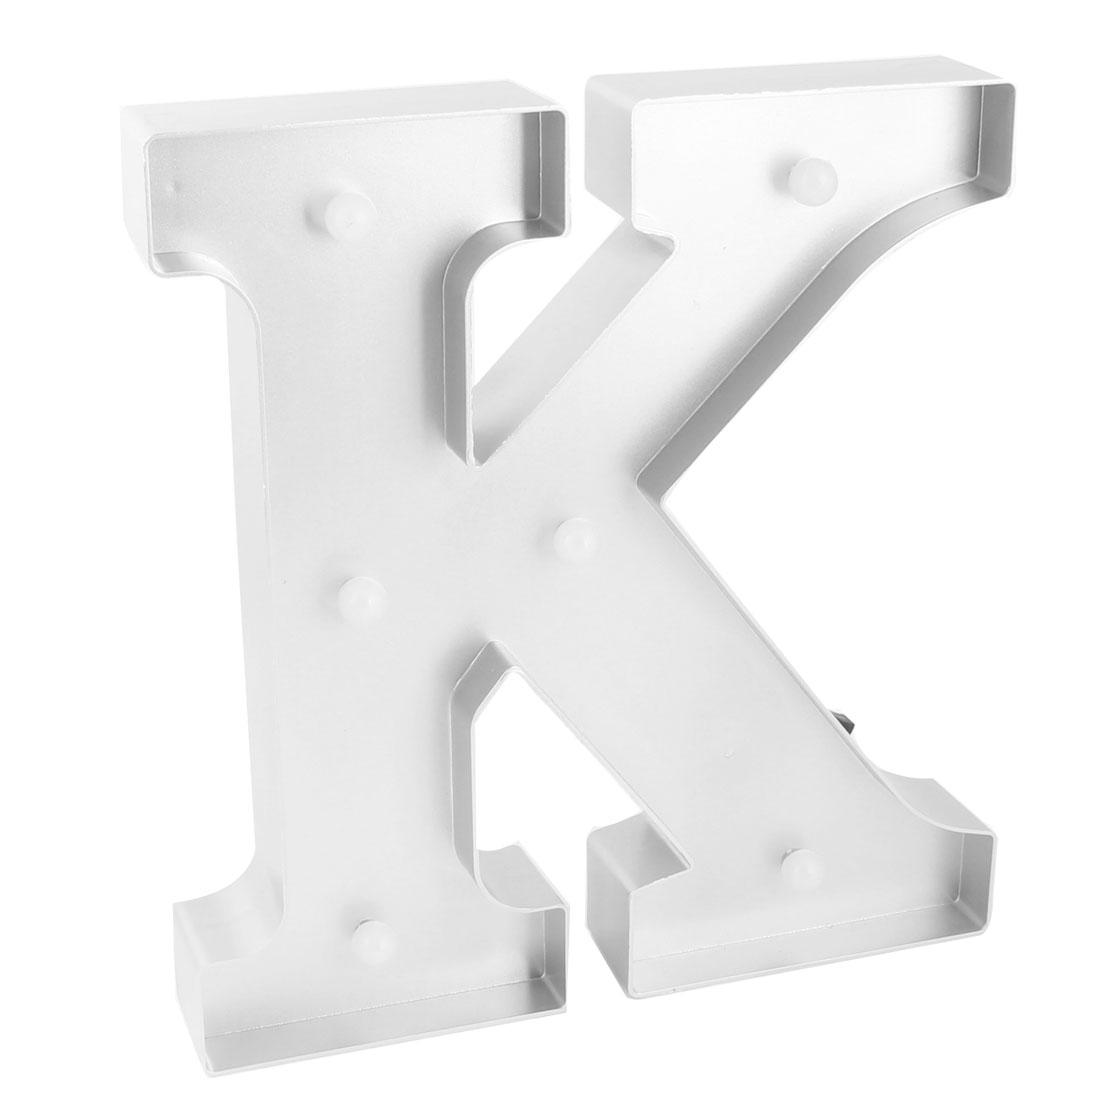 Livingroom Plastic Decor English K Letter Alphabet DIY Hanging LED Light Silver Tone